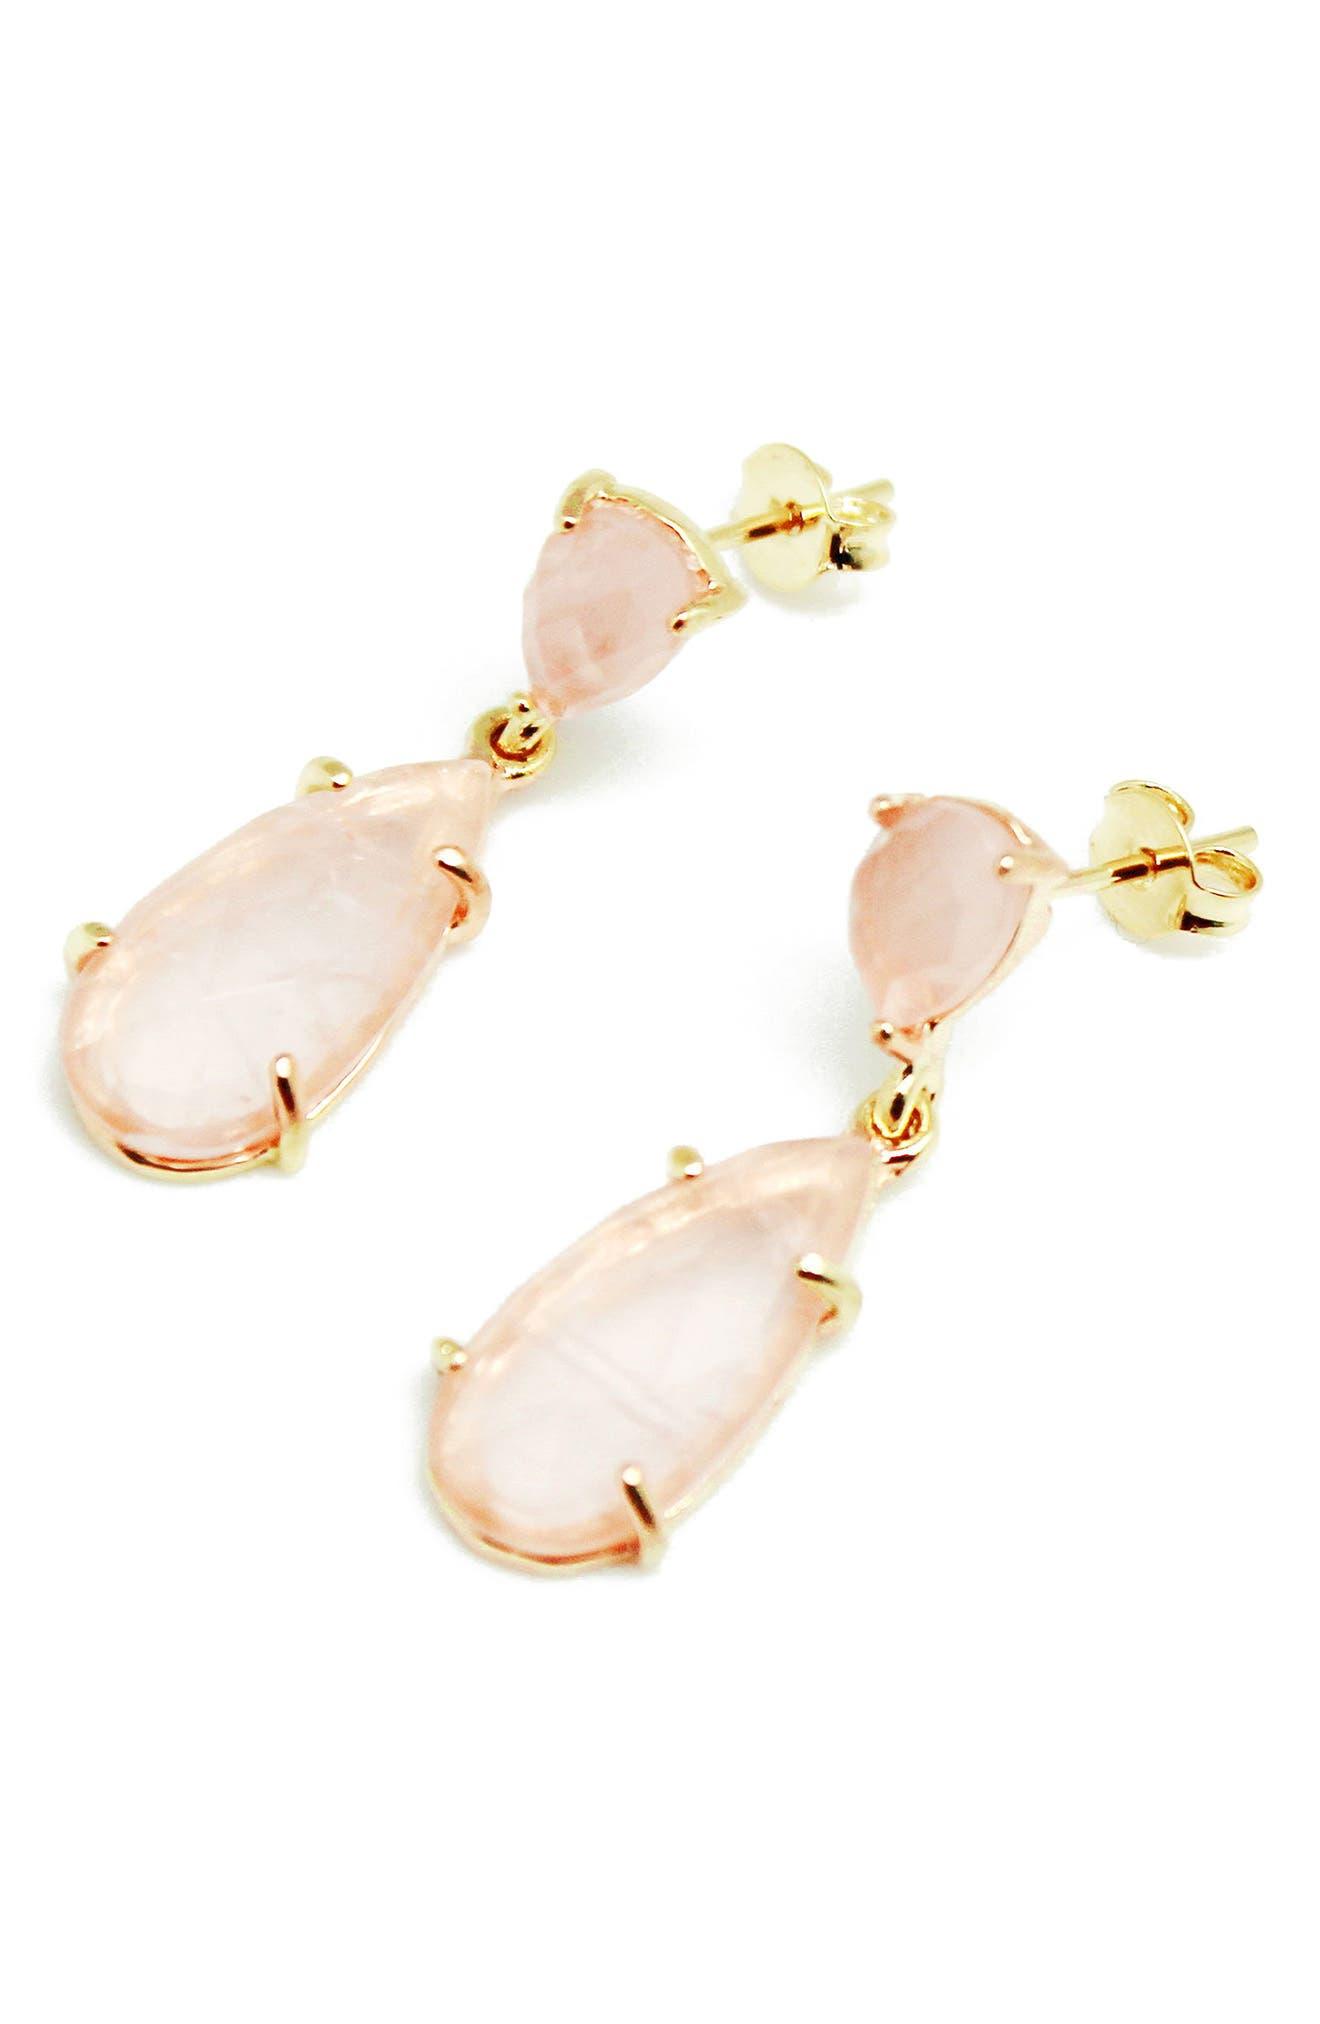 Stone Teardrop Earrings,                         Main,                         color, Rose